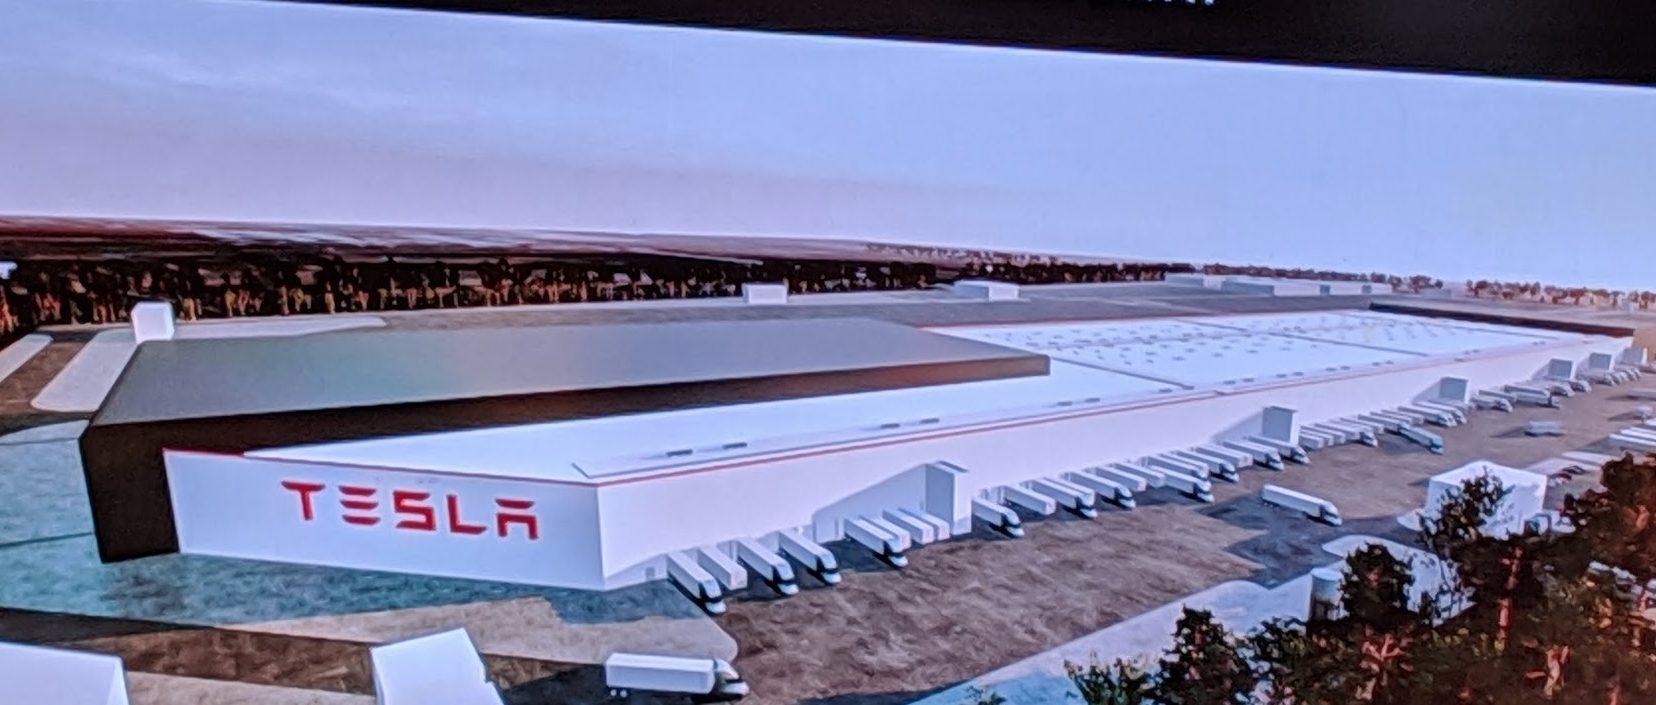 Elon Musk tries to ease Tesla Gigafactory Berlin concerns after protests - Electrek